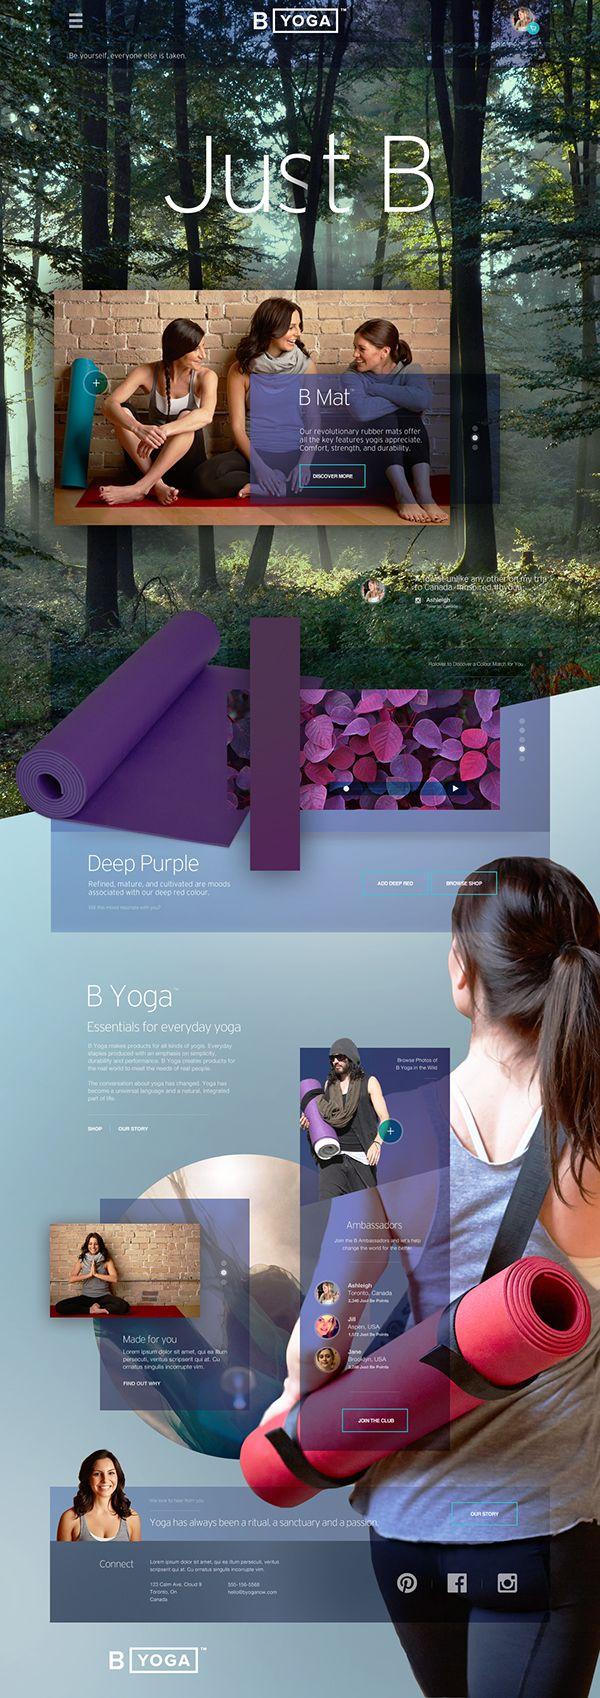 Website design and development for B Yoga.